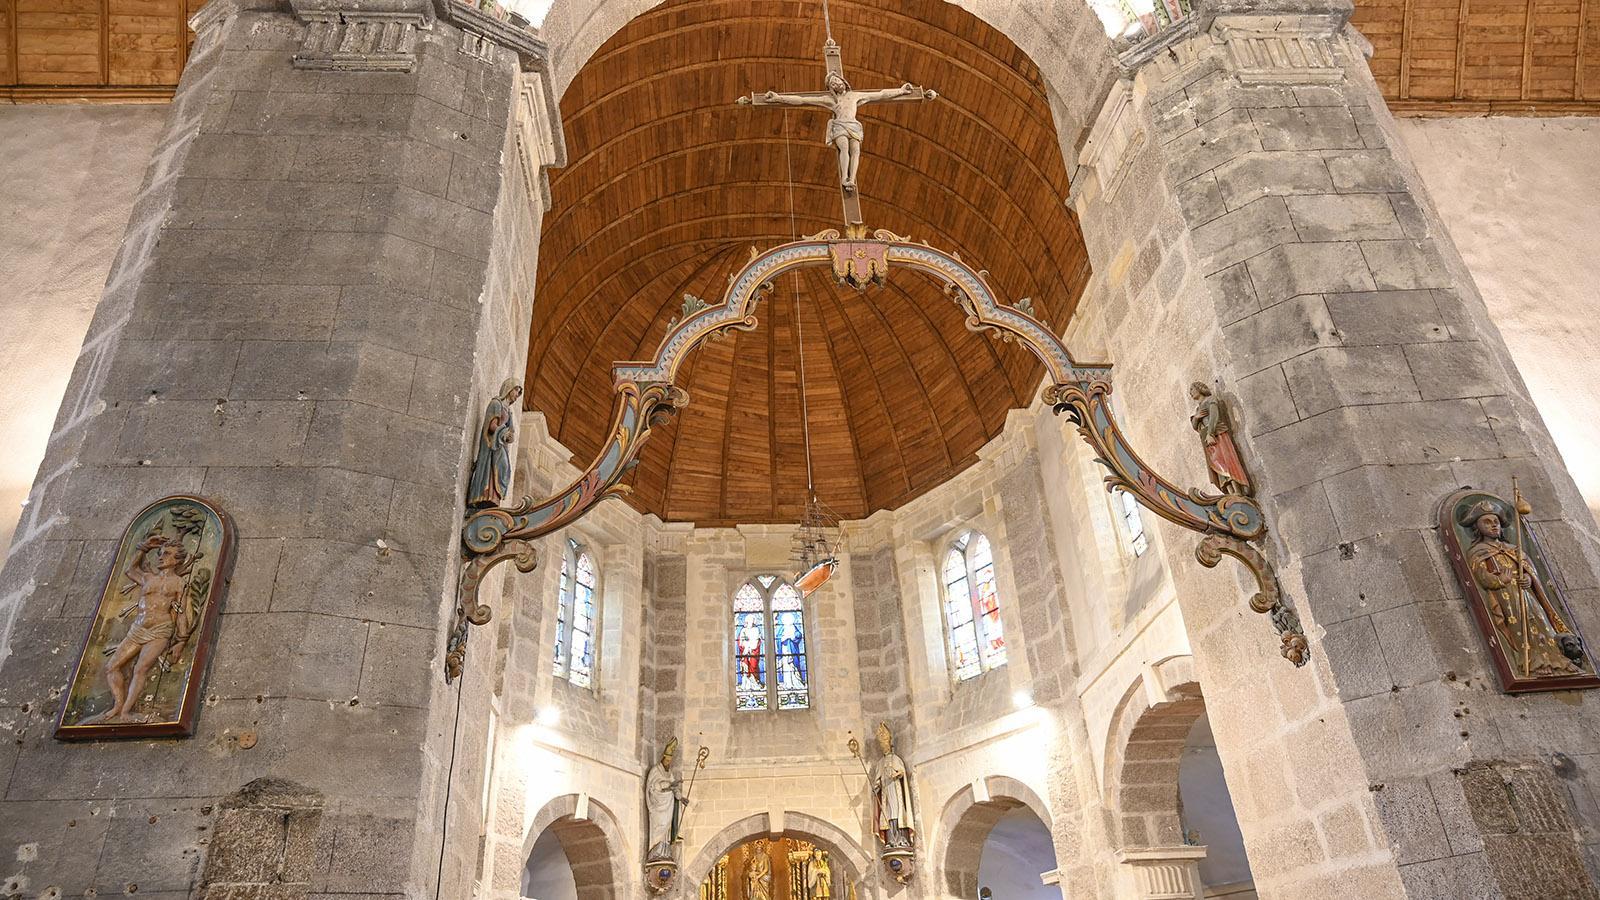 Cotentin, Barfleur: Der Lettner der Pfarrkirche. Foto: Hilke Maunder